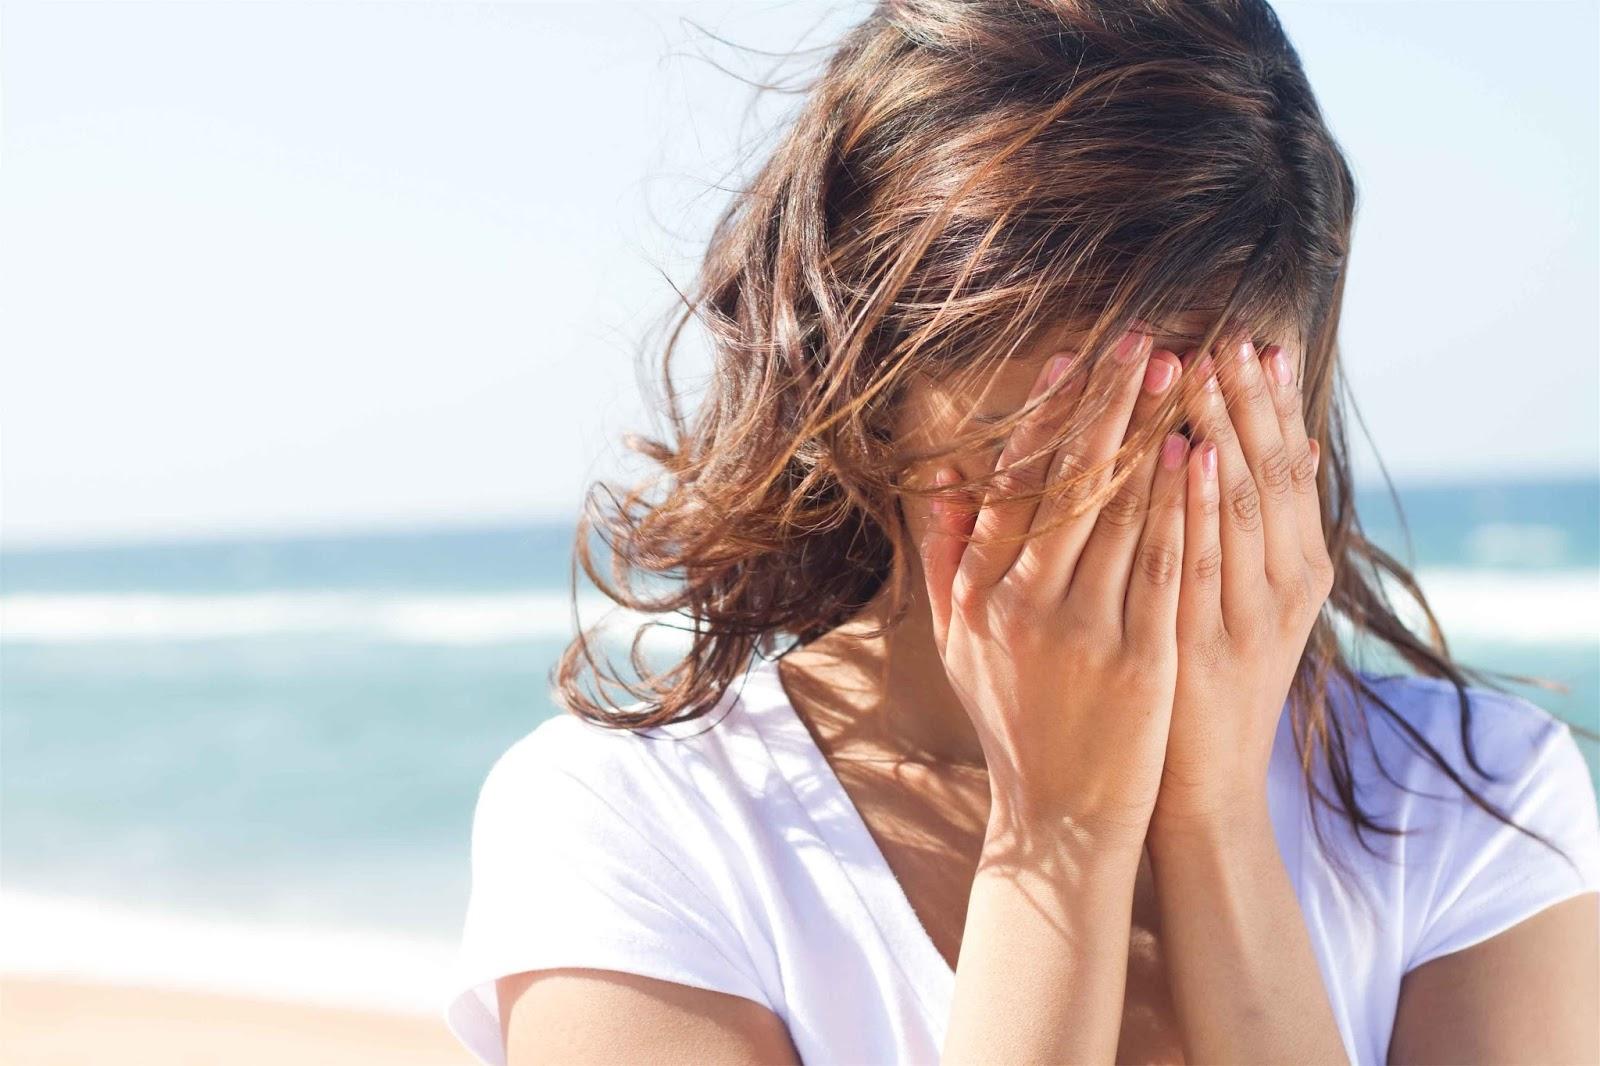 девушка закрыла лицо руками, девушка на фоне моря